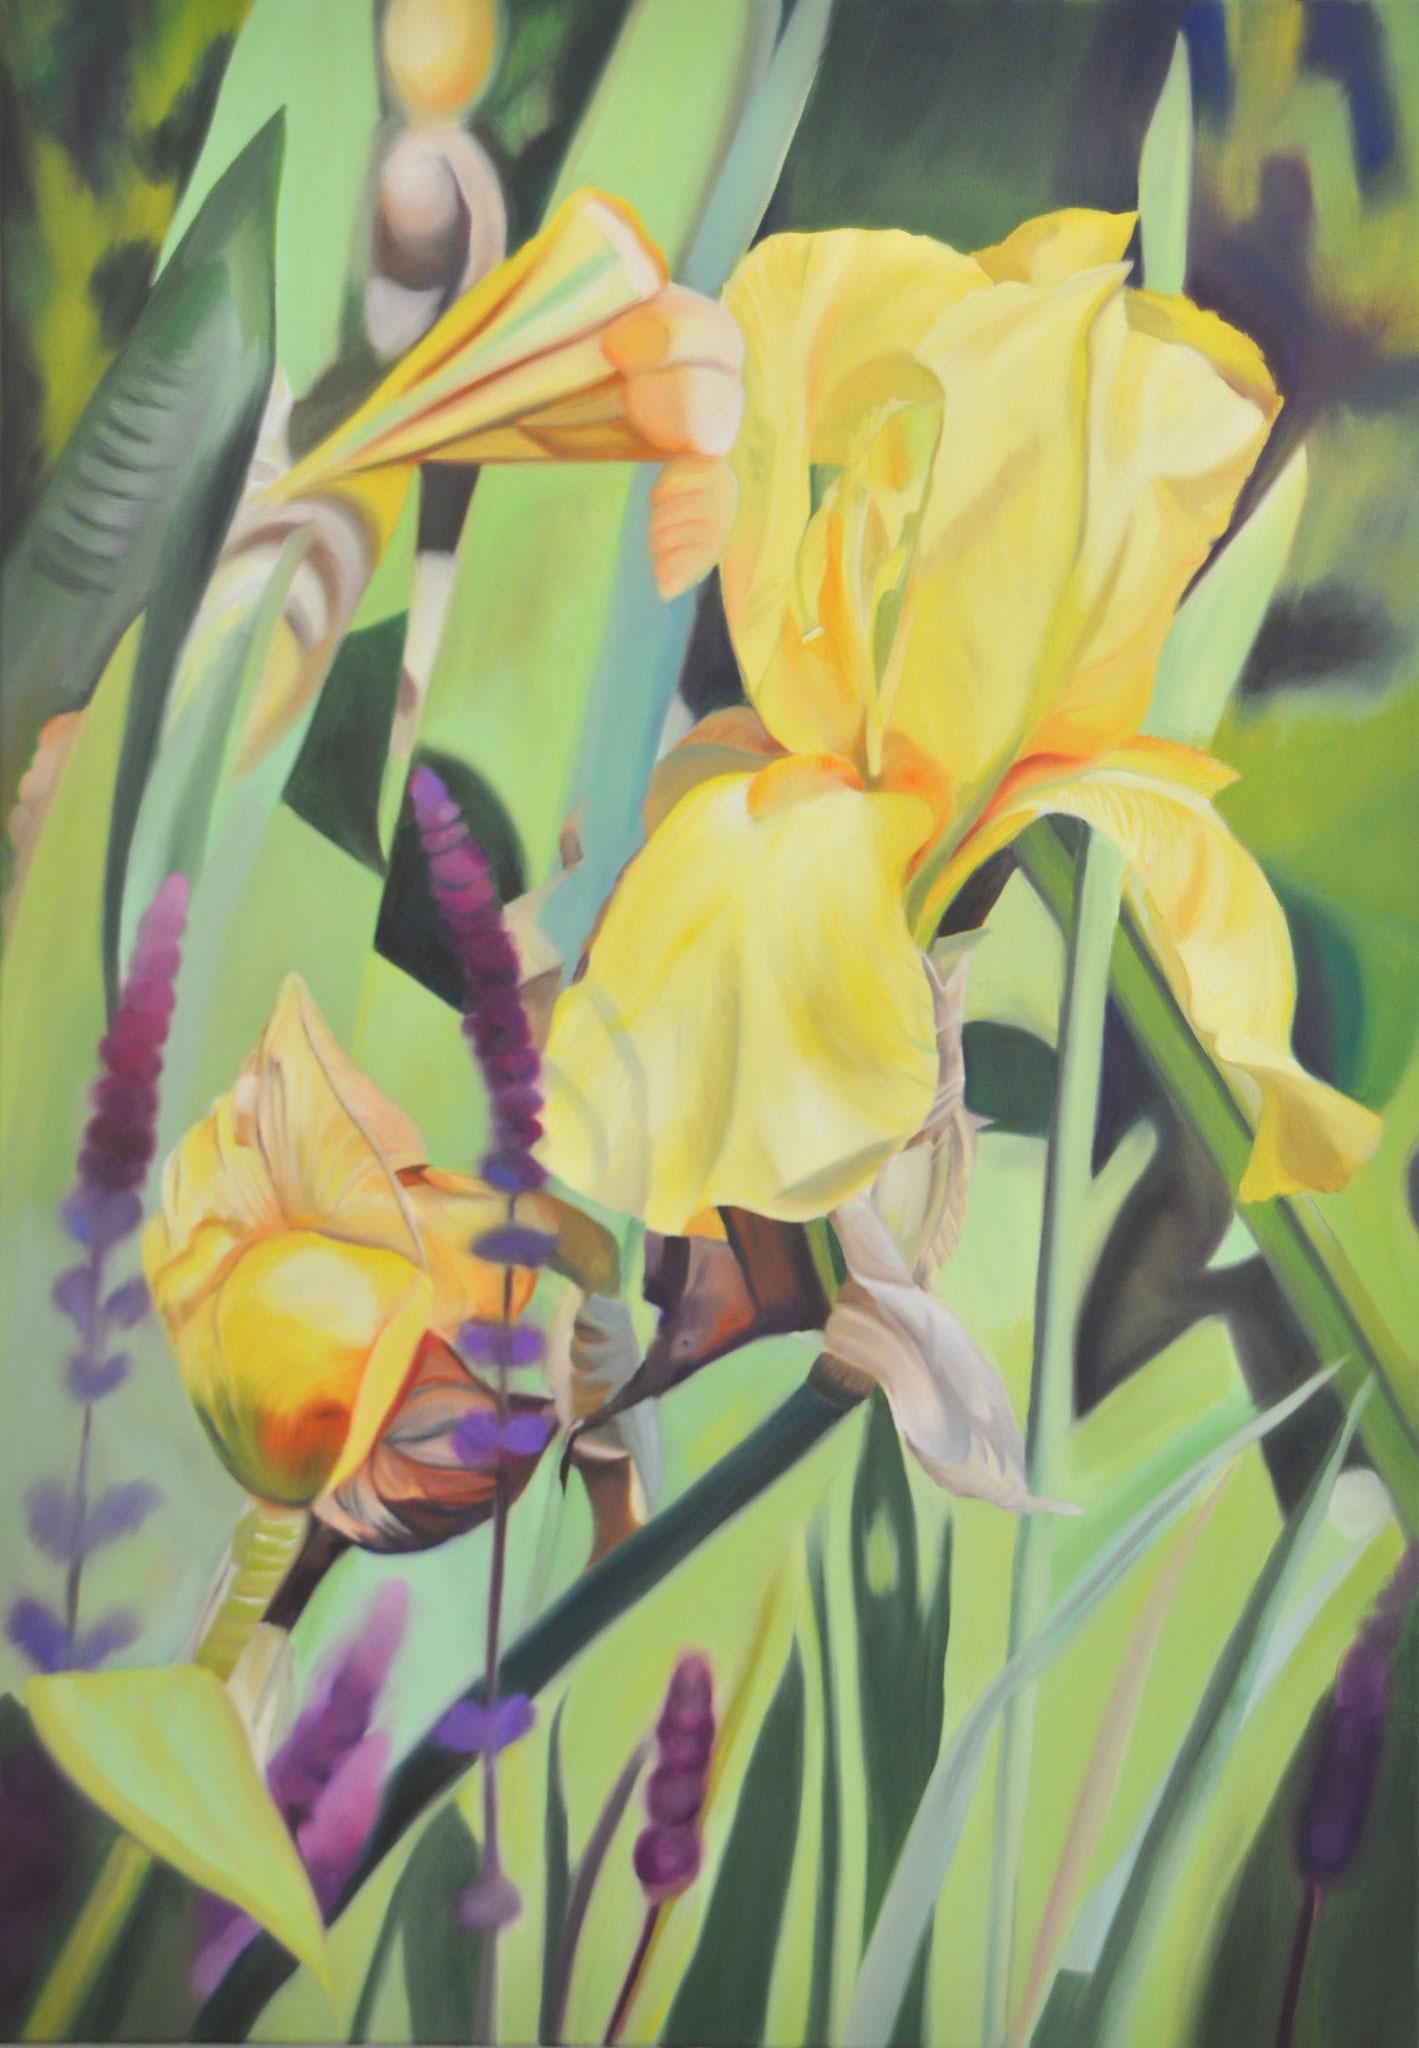 Gelbe Lilie, 100 x 70 cm